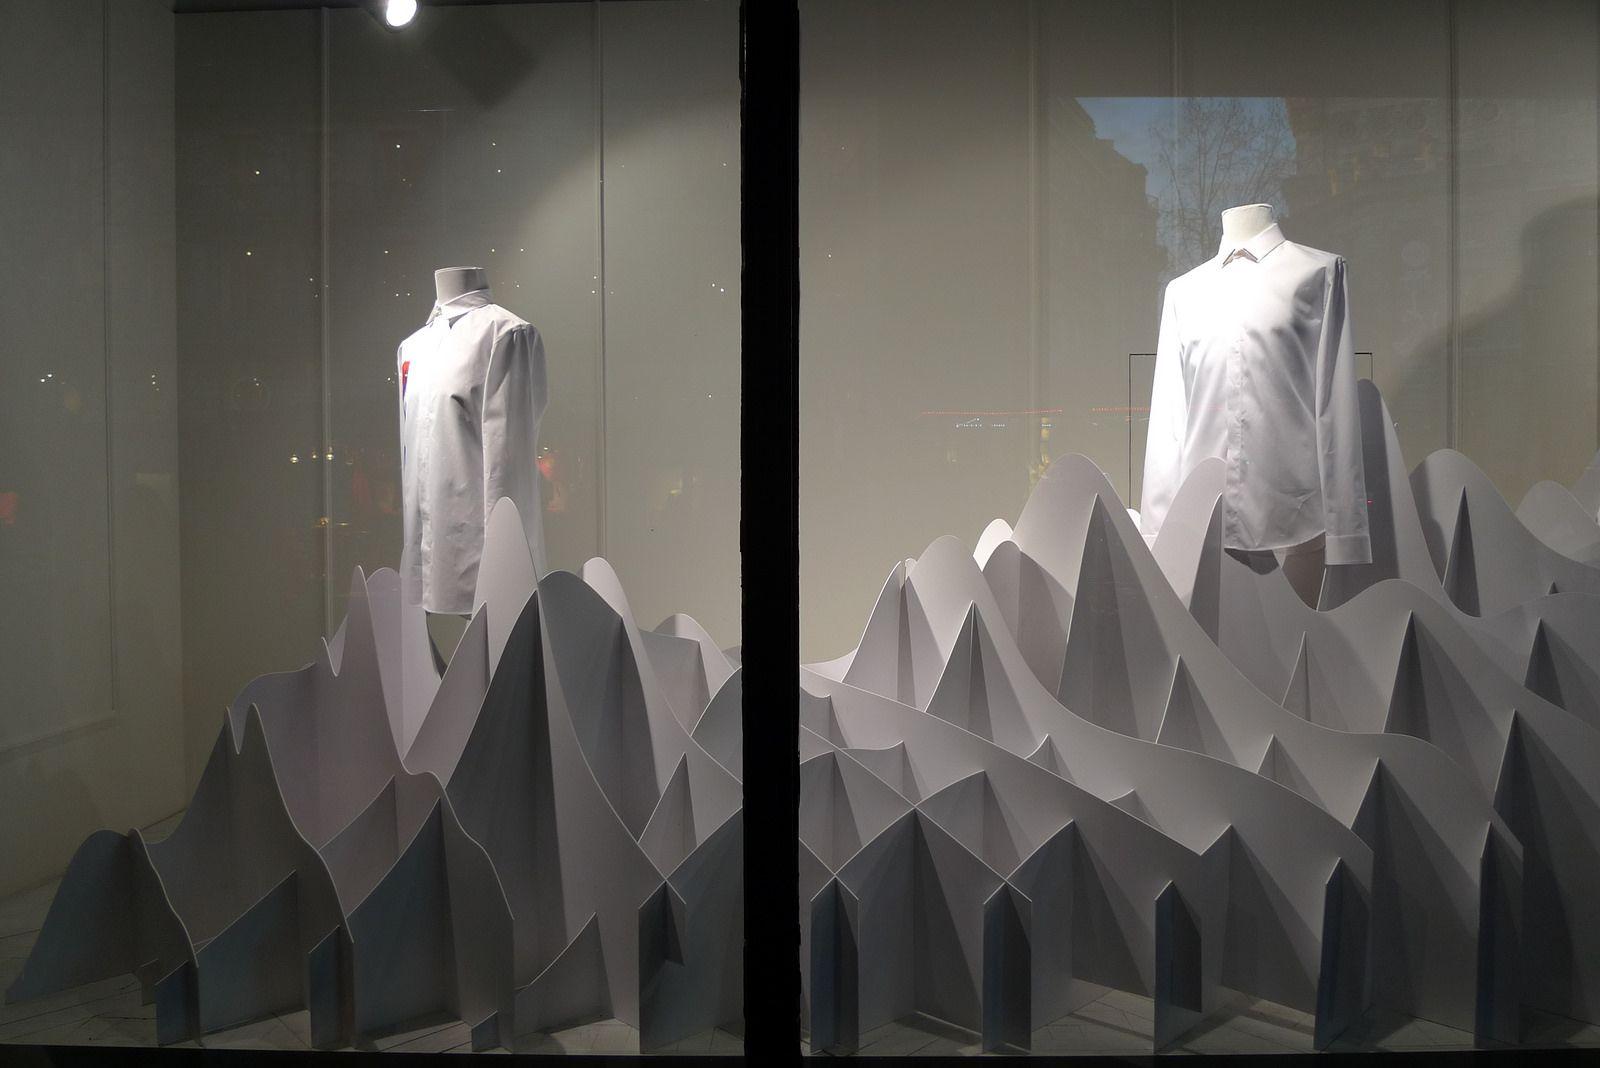 Vitrines des Galeries Lafayette - Paris, mars 2014 | da JournalDesVitrines.com